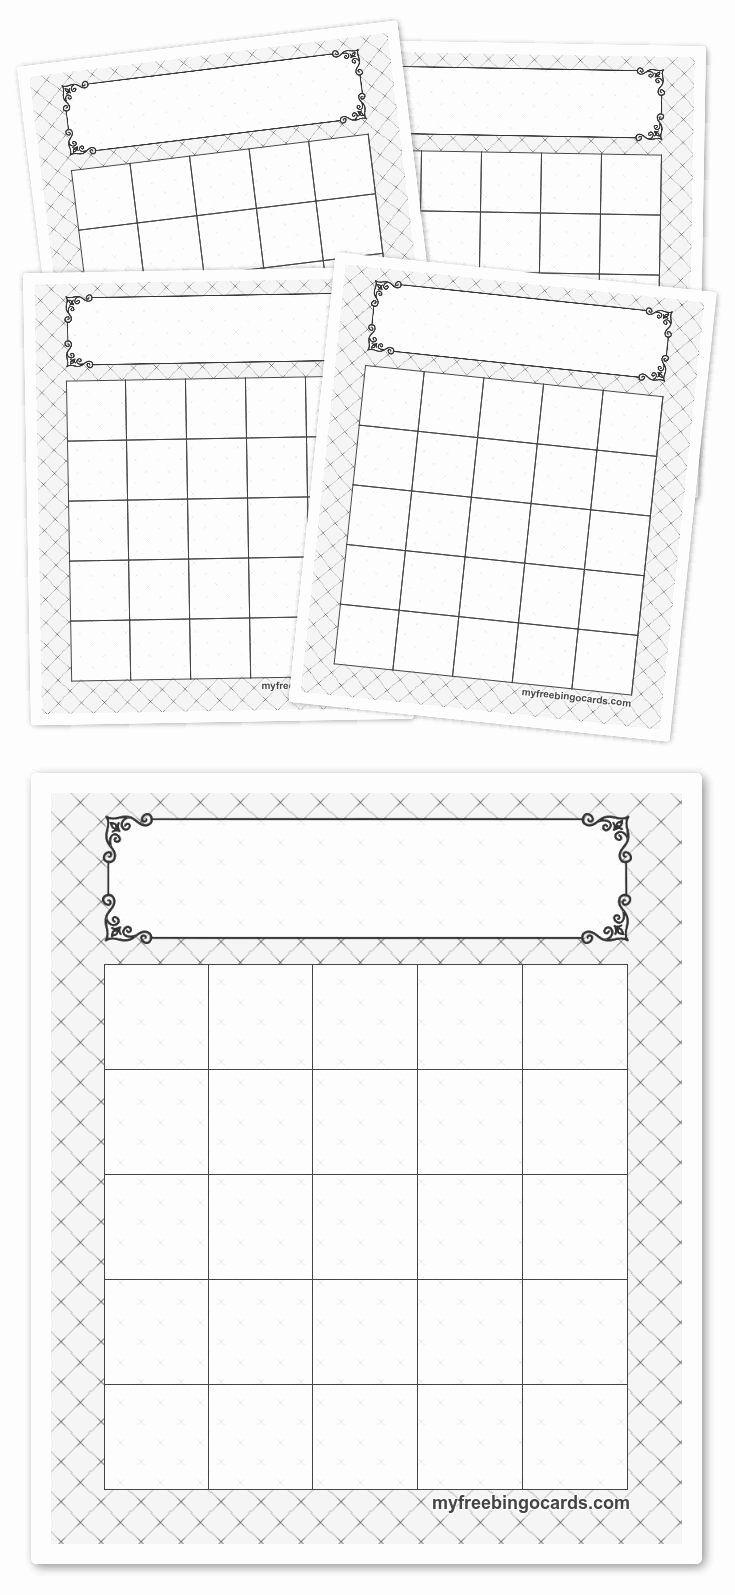 Blank Uno Card Template In 2020 Free Printable Bingo Cards